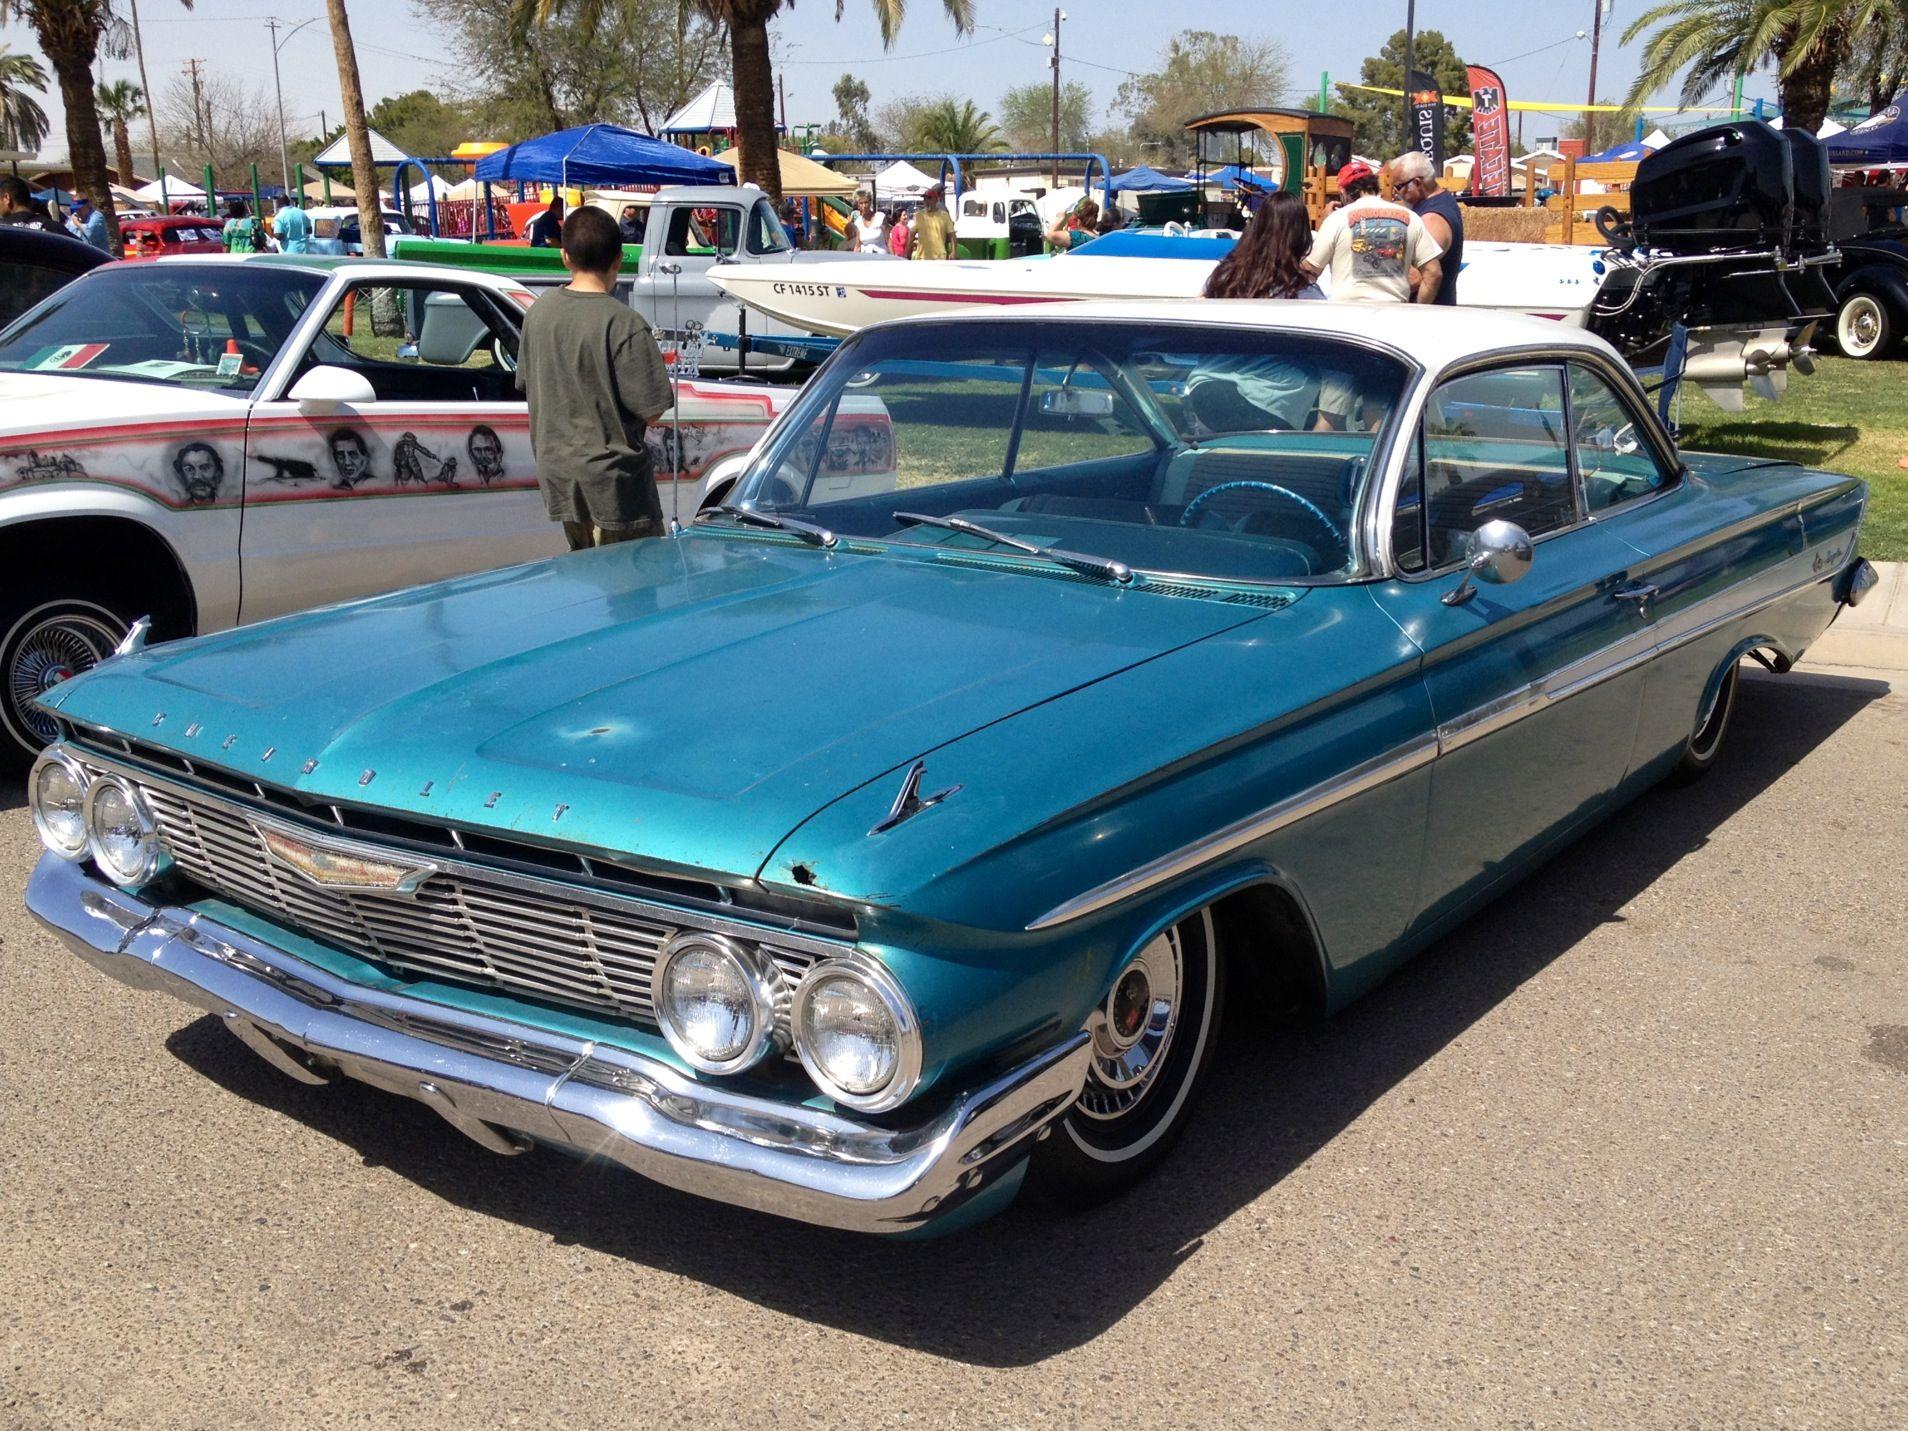 61 chevy impala cool cars pinterest cars rh pinterest ch